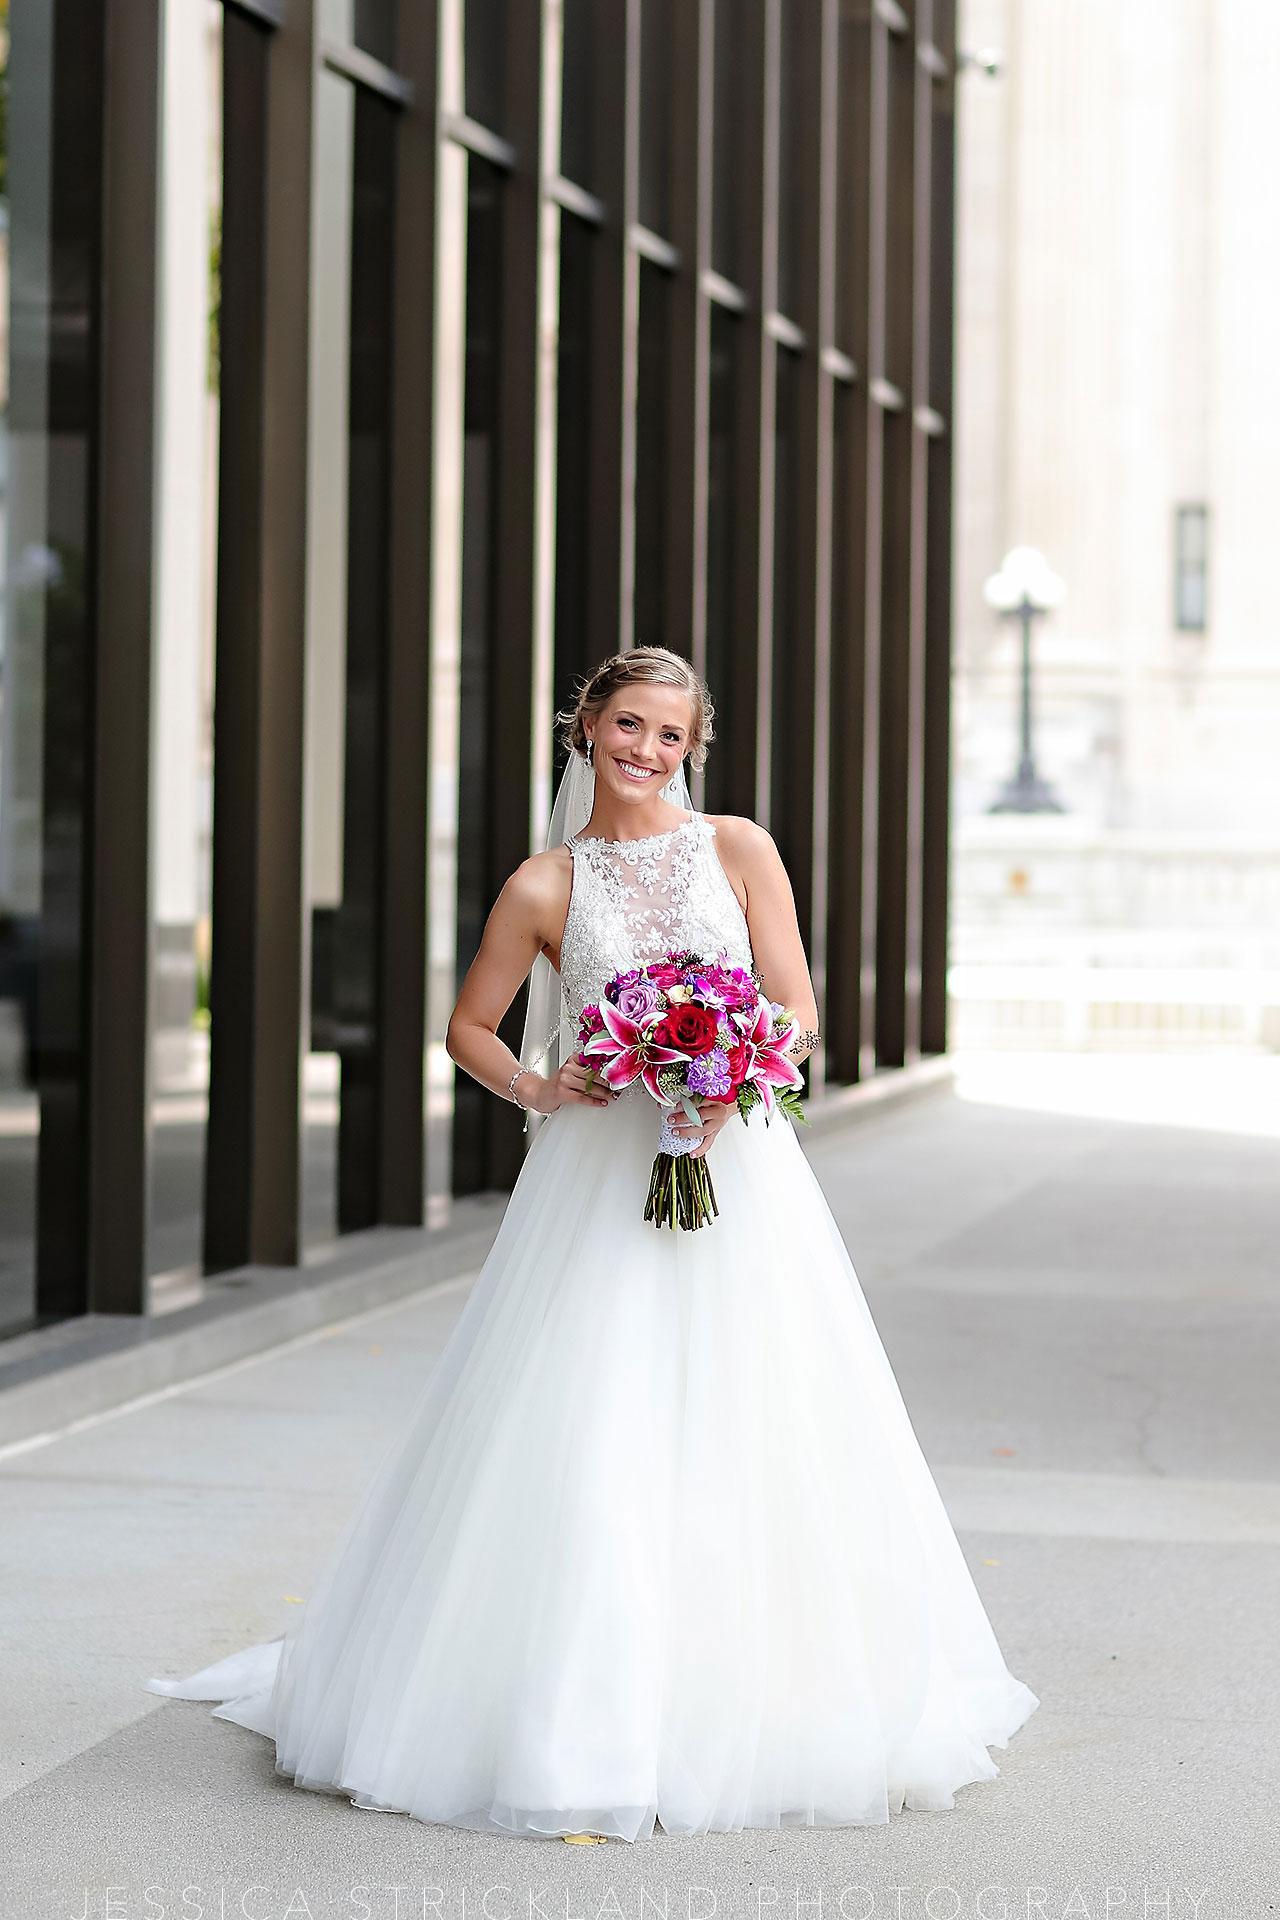 Serra Alex Regions Tower Indianapolis Wedding 119 watermarked